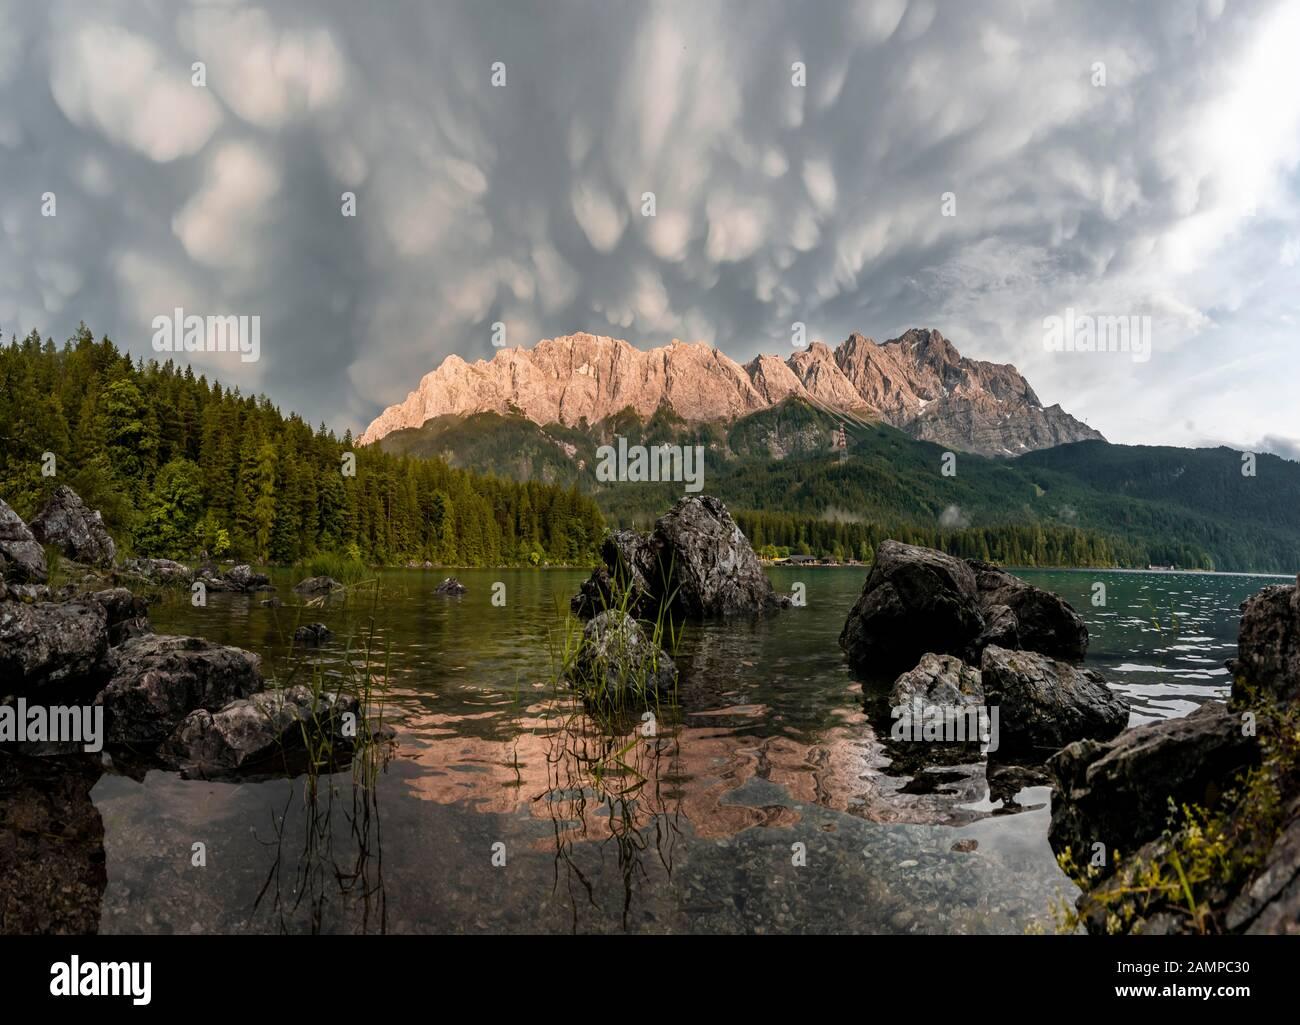 Rocks on the shore, Eibsee lake in front of Zugspitze massif with Zugspitze, sunset, dramatic Mammaten clouds, Wetterstein range, near Grainau, Upper Stock Photo